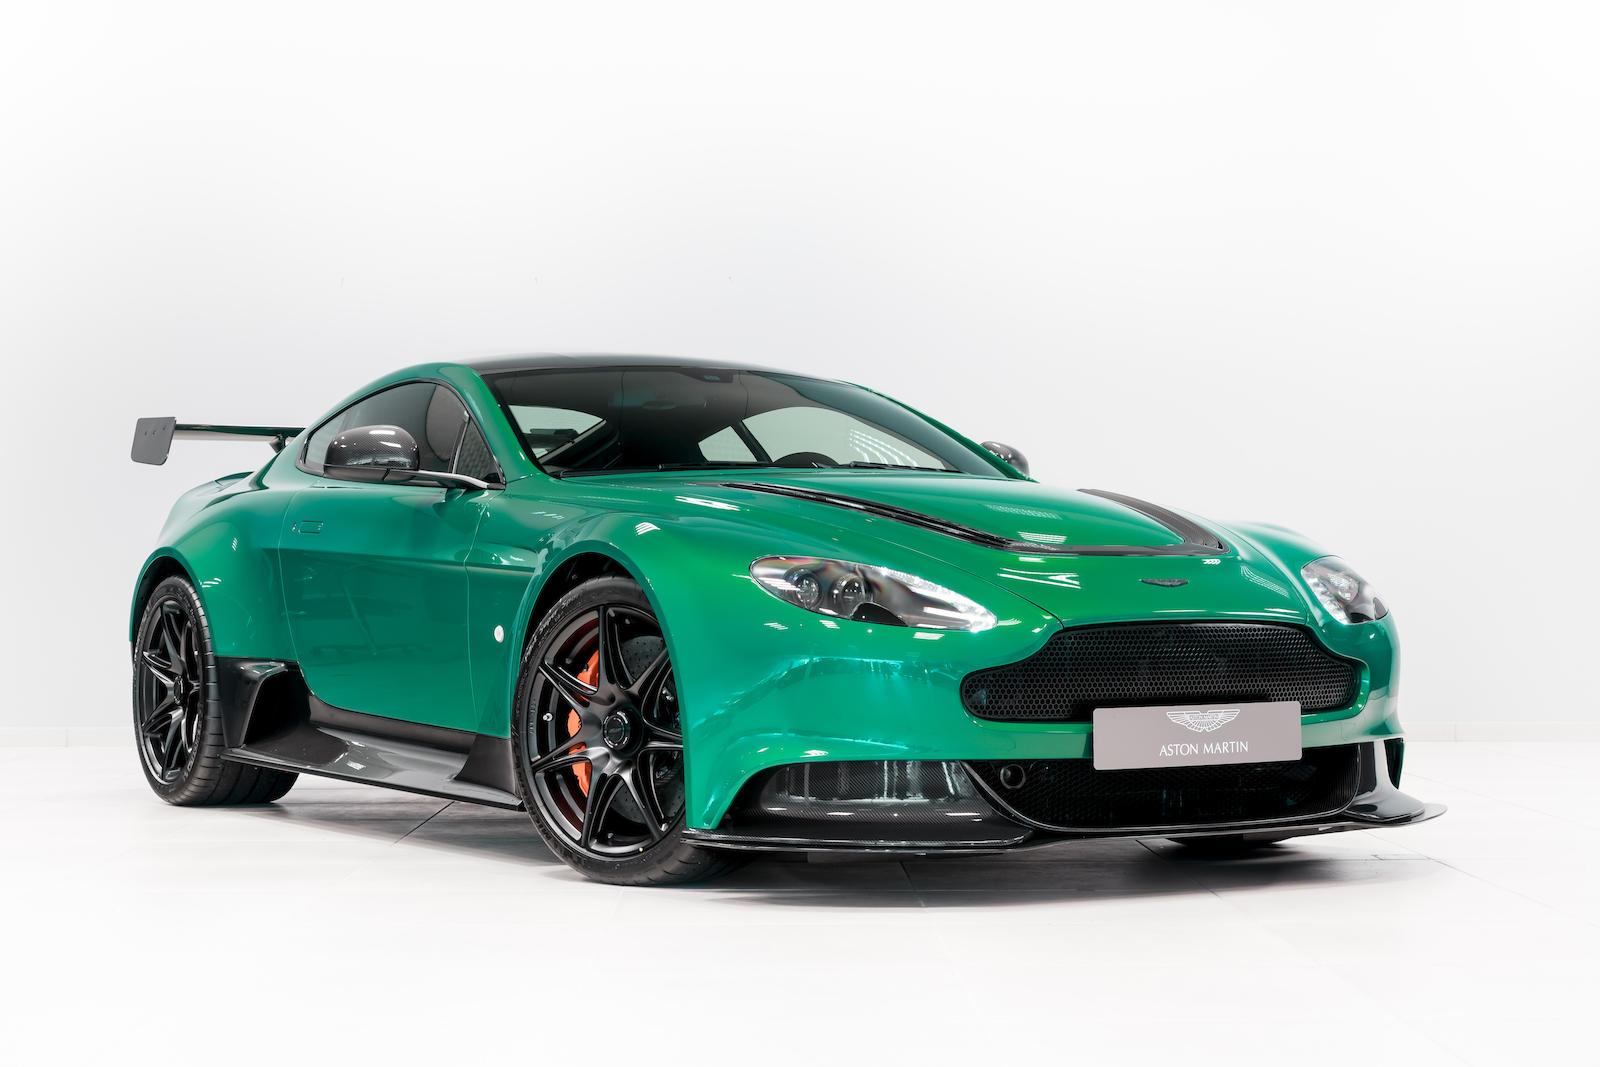 One Of One Viridian Green Aston Martin Vantage Gt12 Looks Like A Million Bucks Autoevolution